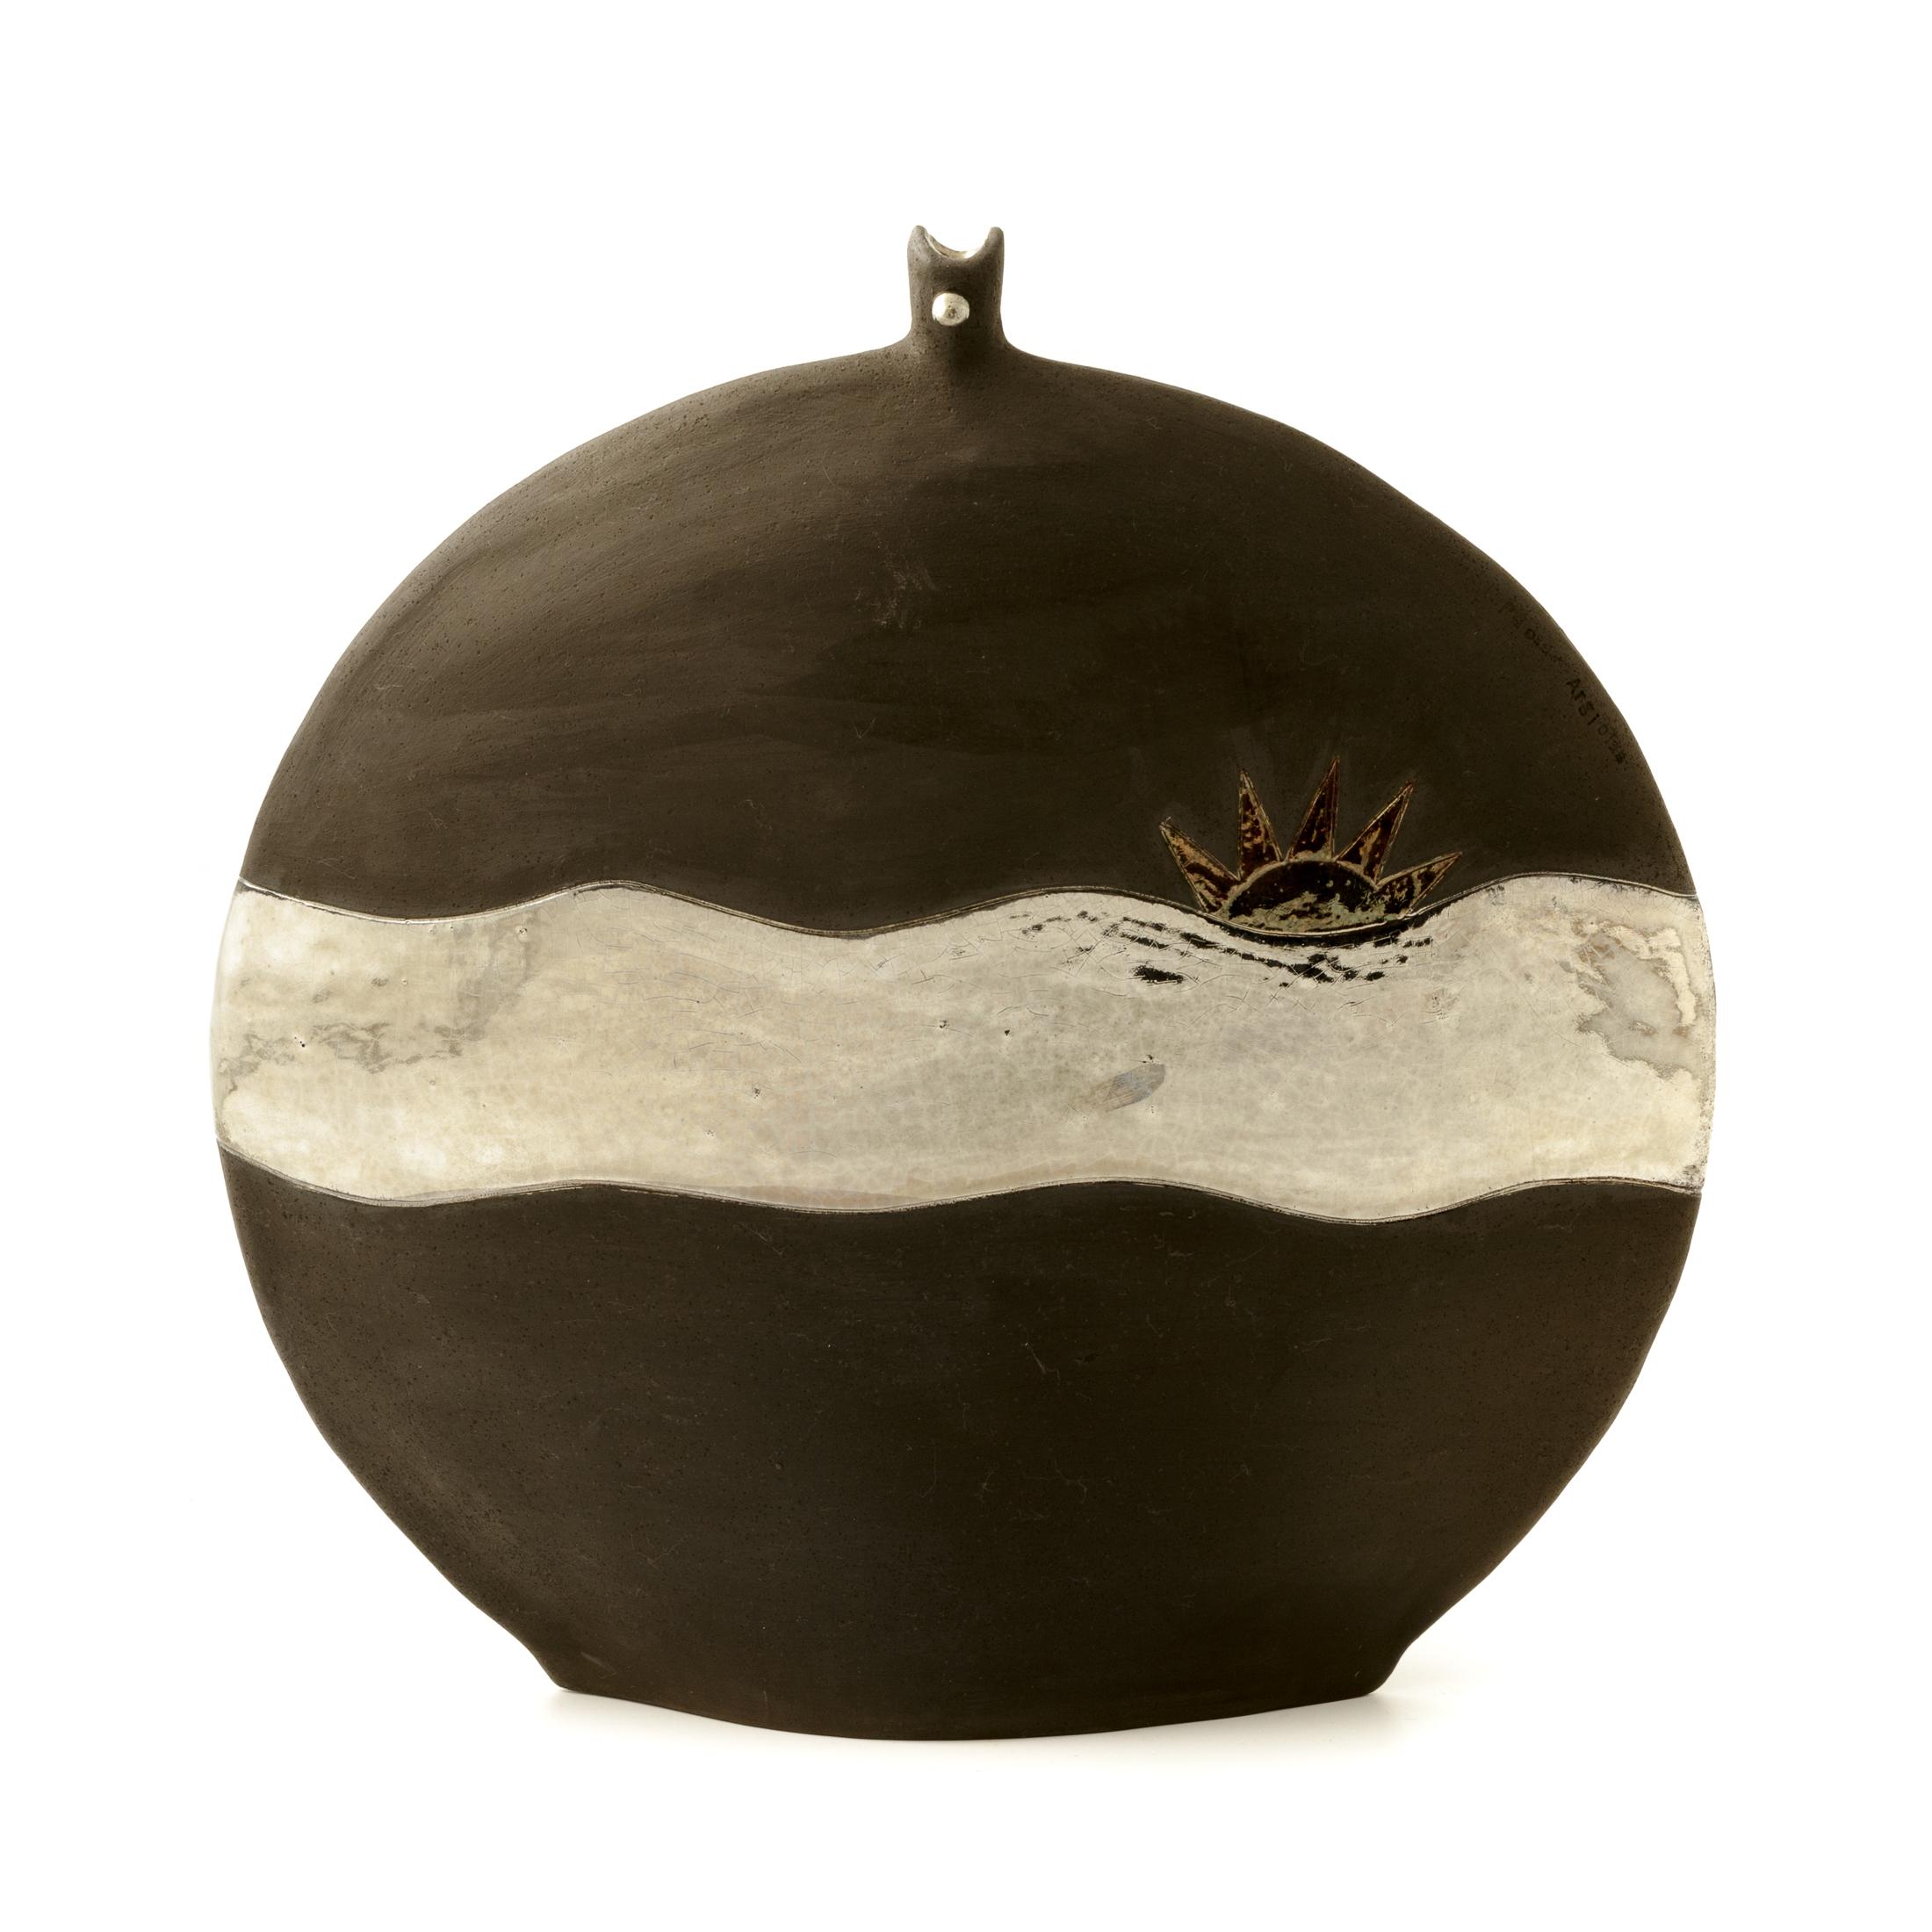 ceram-art-paola-argiolas-ceramisti-monserrato-cagliari-thumbnail